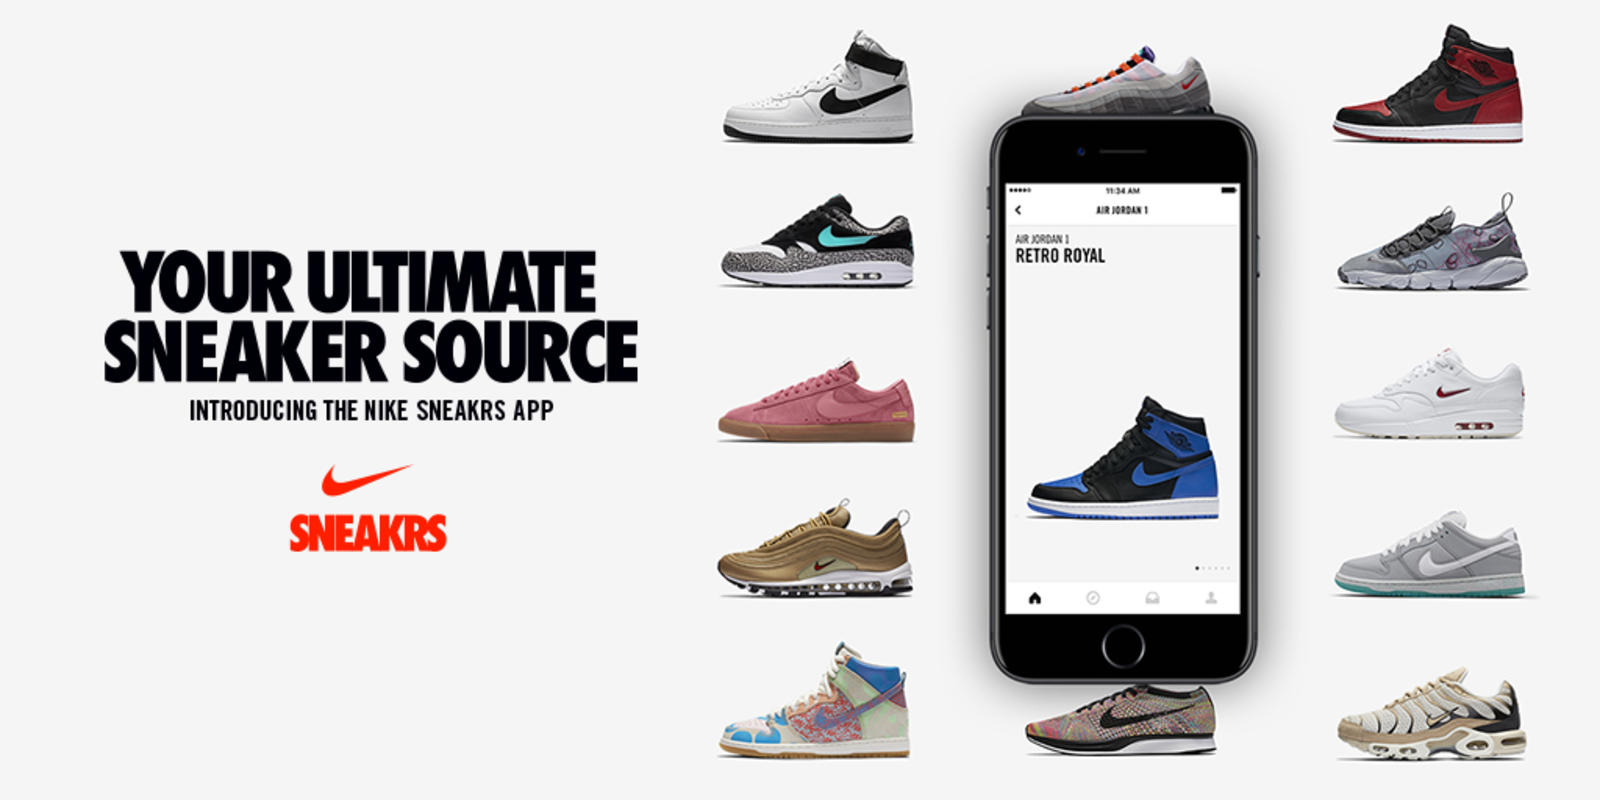 Disfrazado tubo respirador Alergia  The Nike SNEAKRS App Launches in Europe - WearTesters